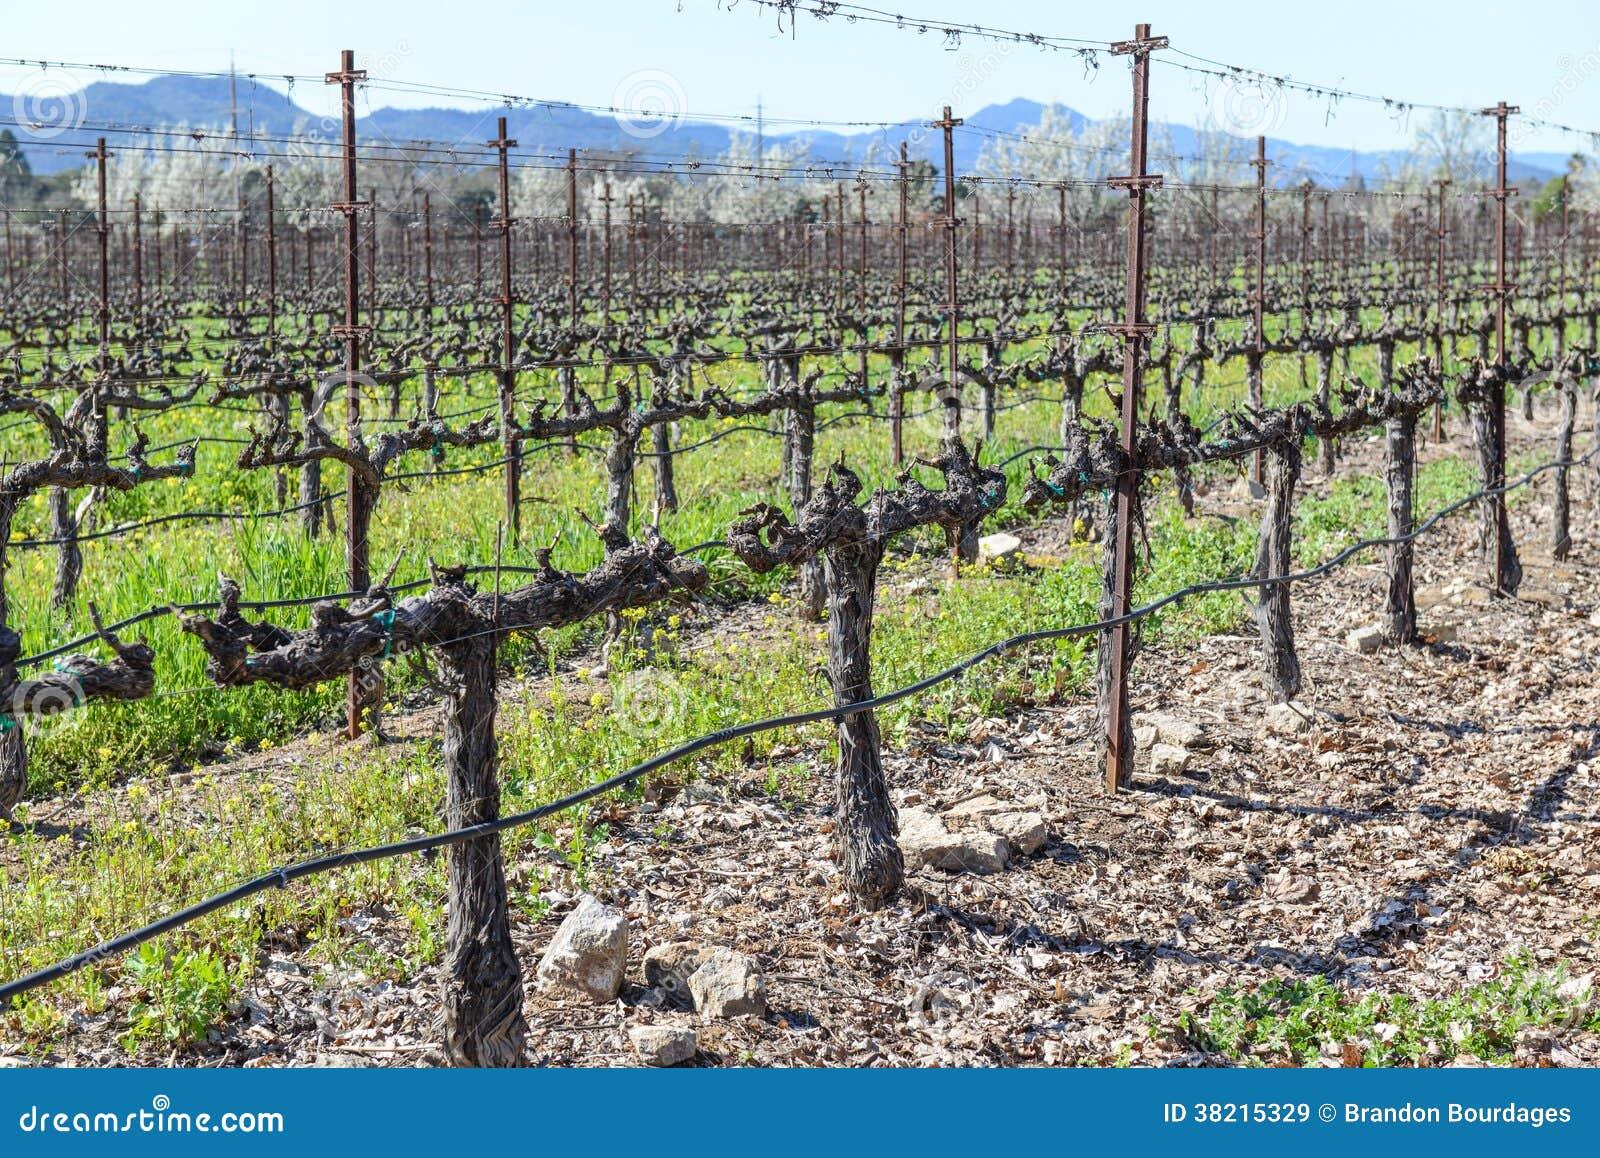 Best Plant Food For Grape Vines